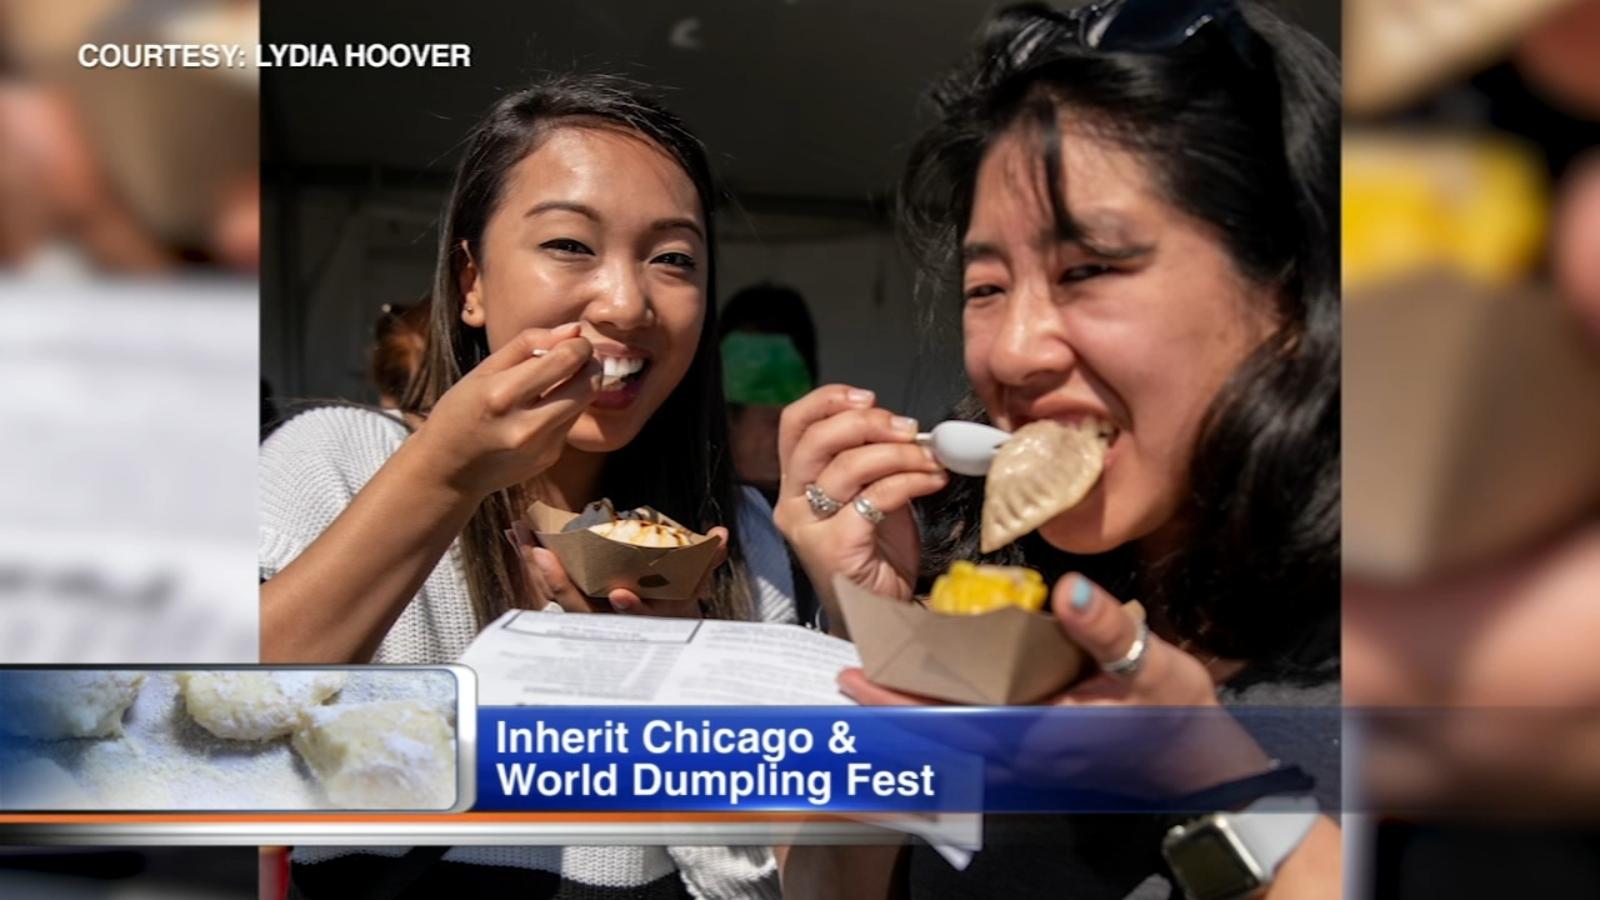 World Dumpling Fest to kick off 2nd Annual Inherit Chicago Festival